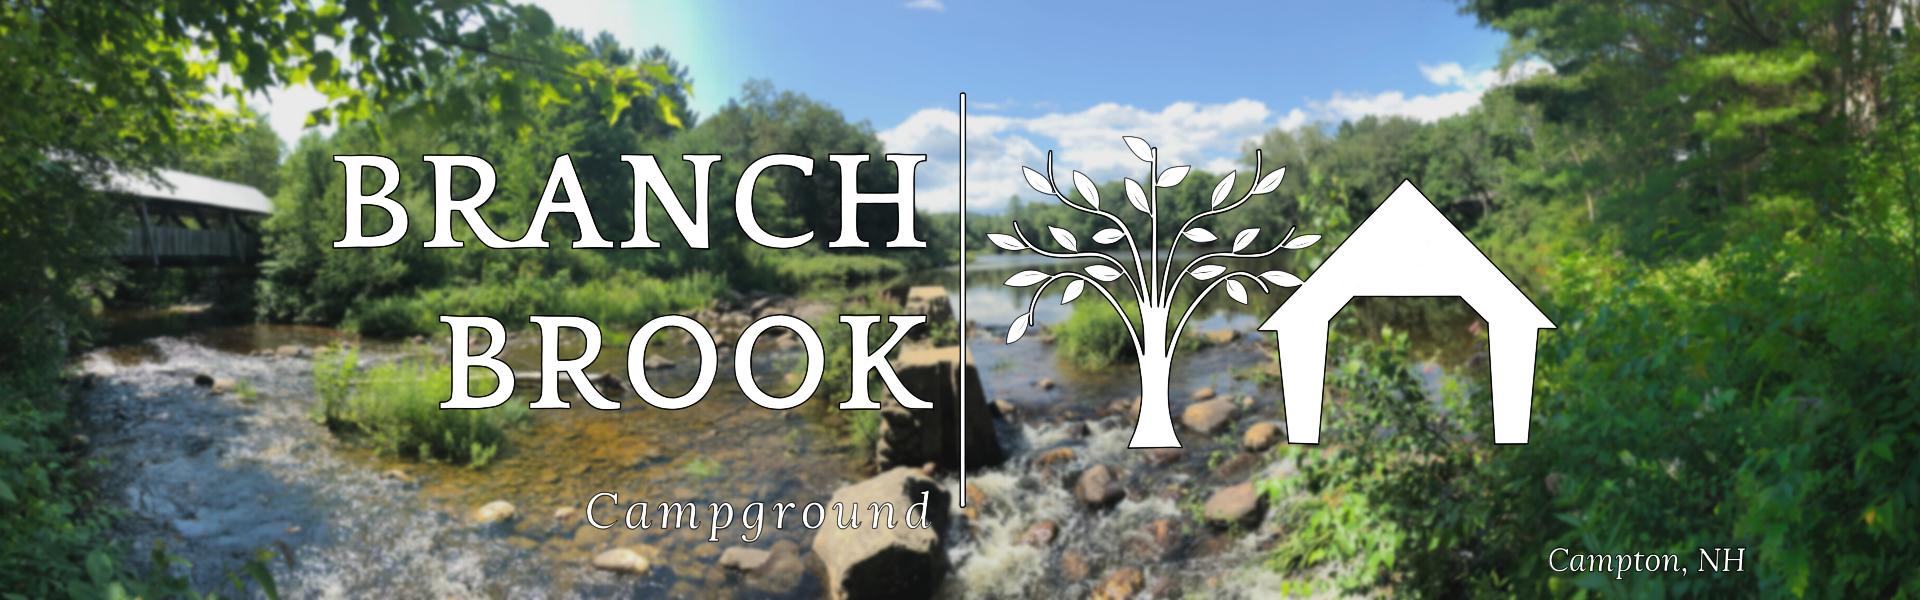 Branch Brook Campground